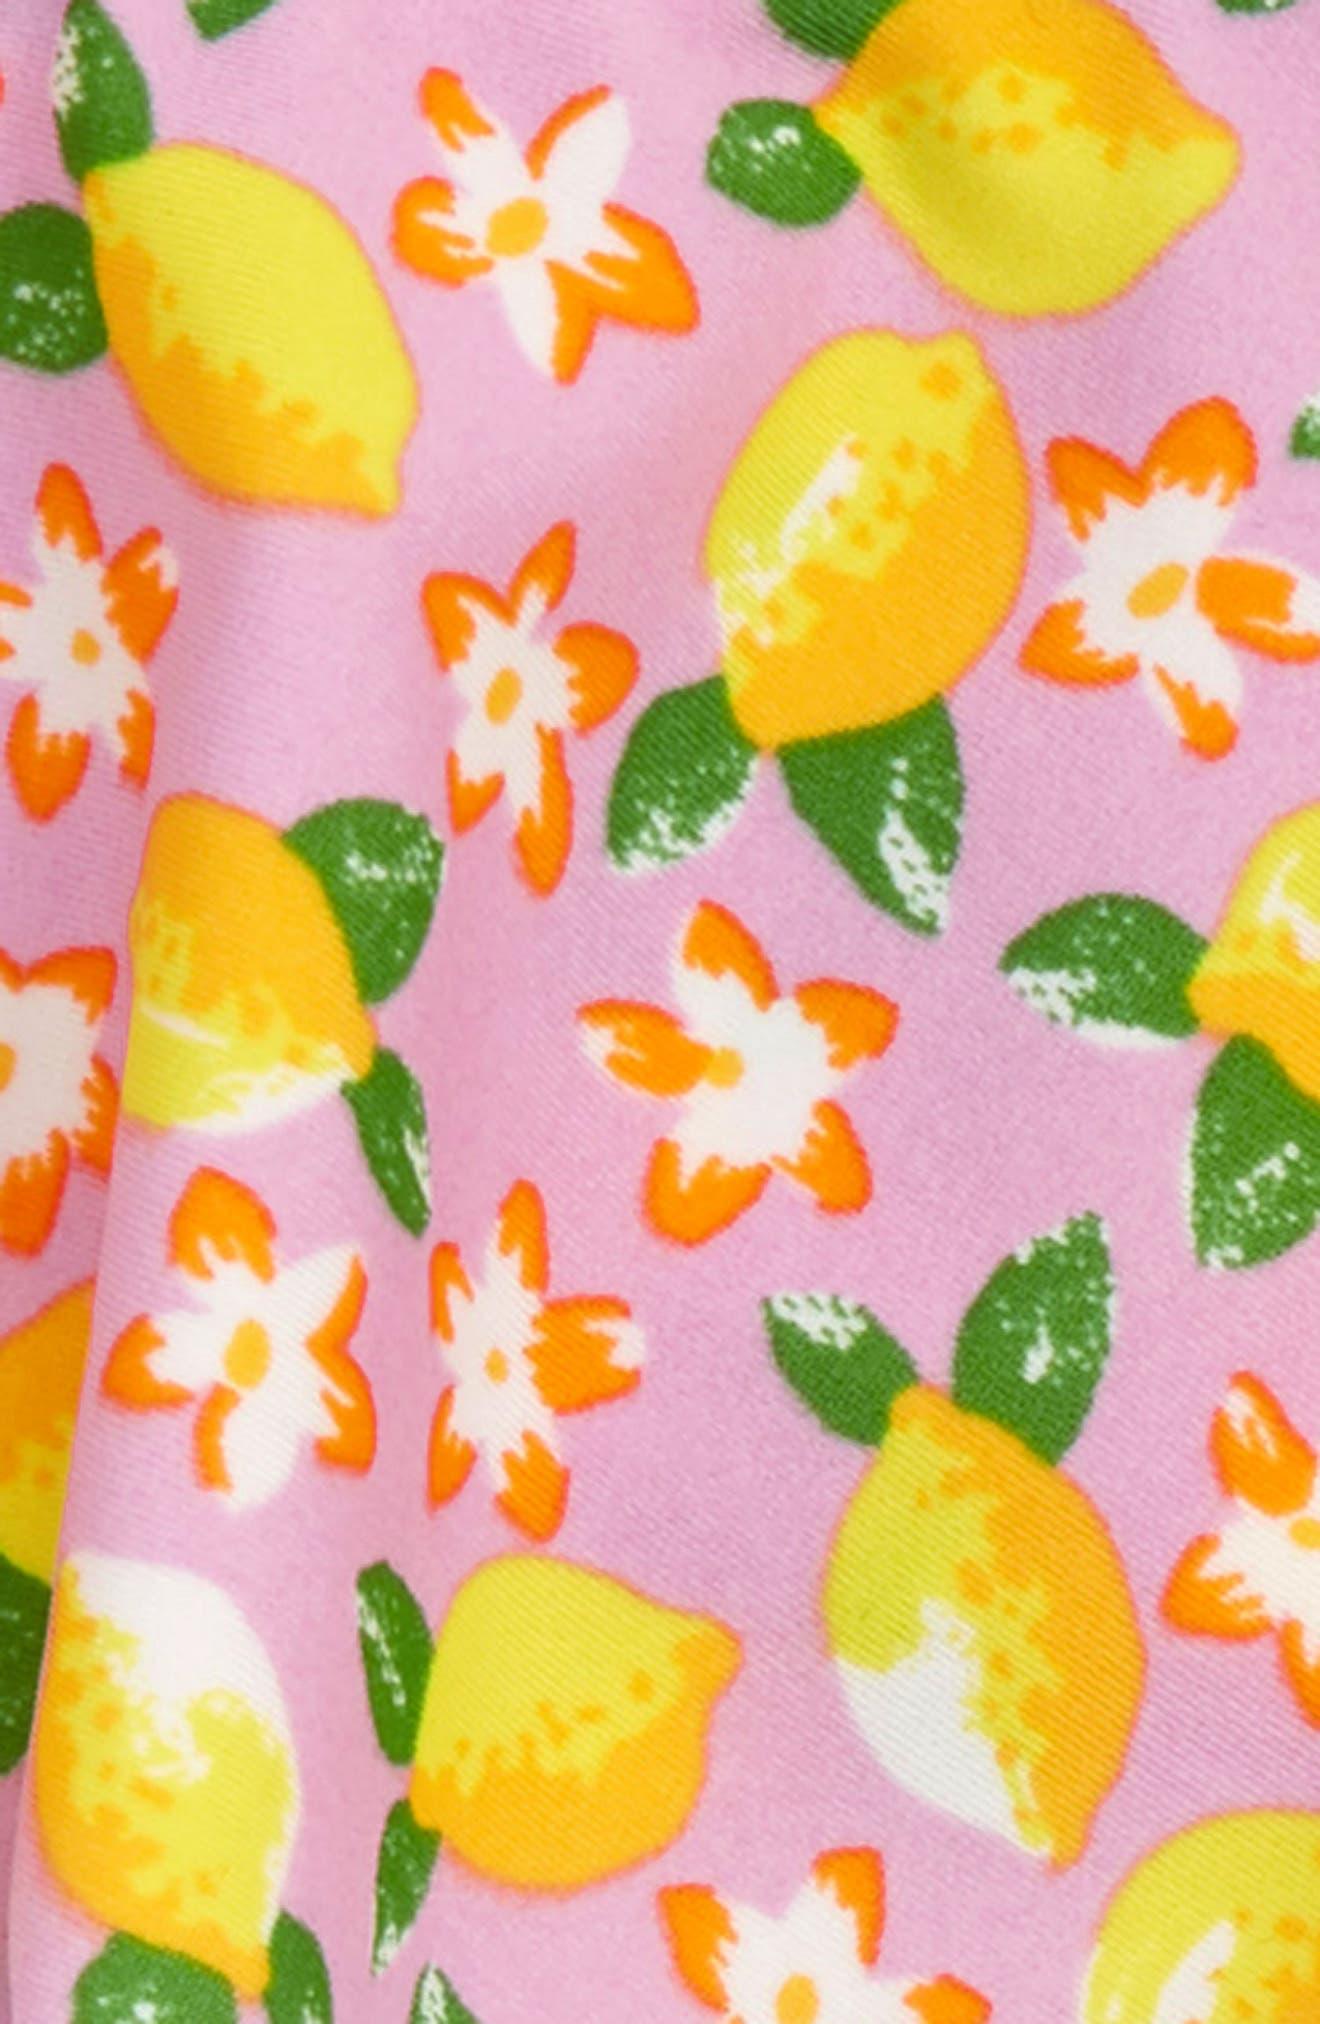 Lemon Print Ruffle Two-Piece Swimsuit,                             Alternate thumbnail 2, color,                             650